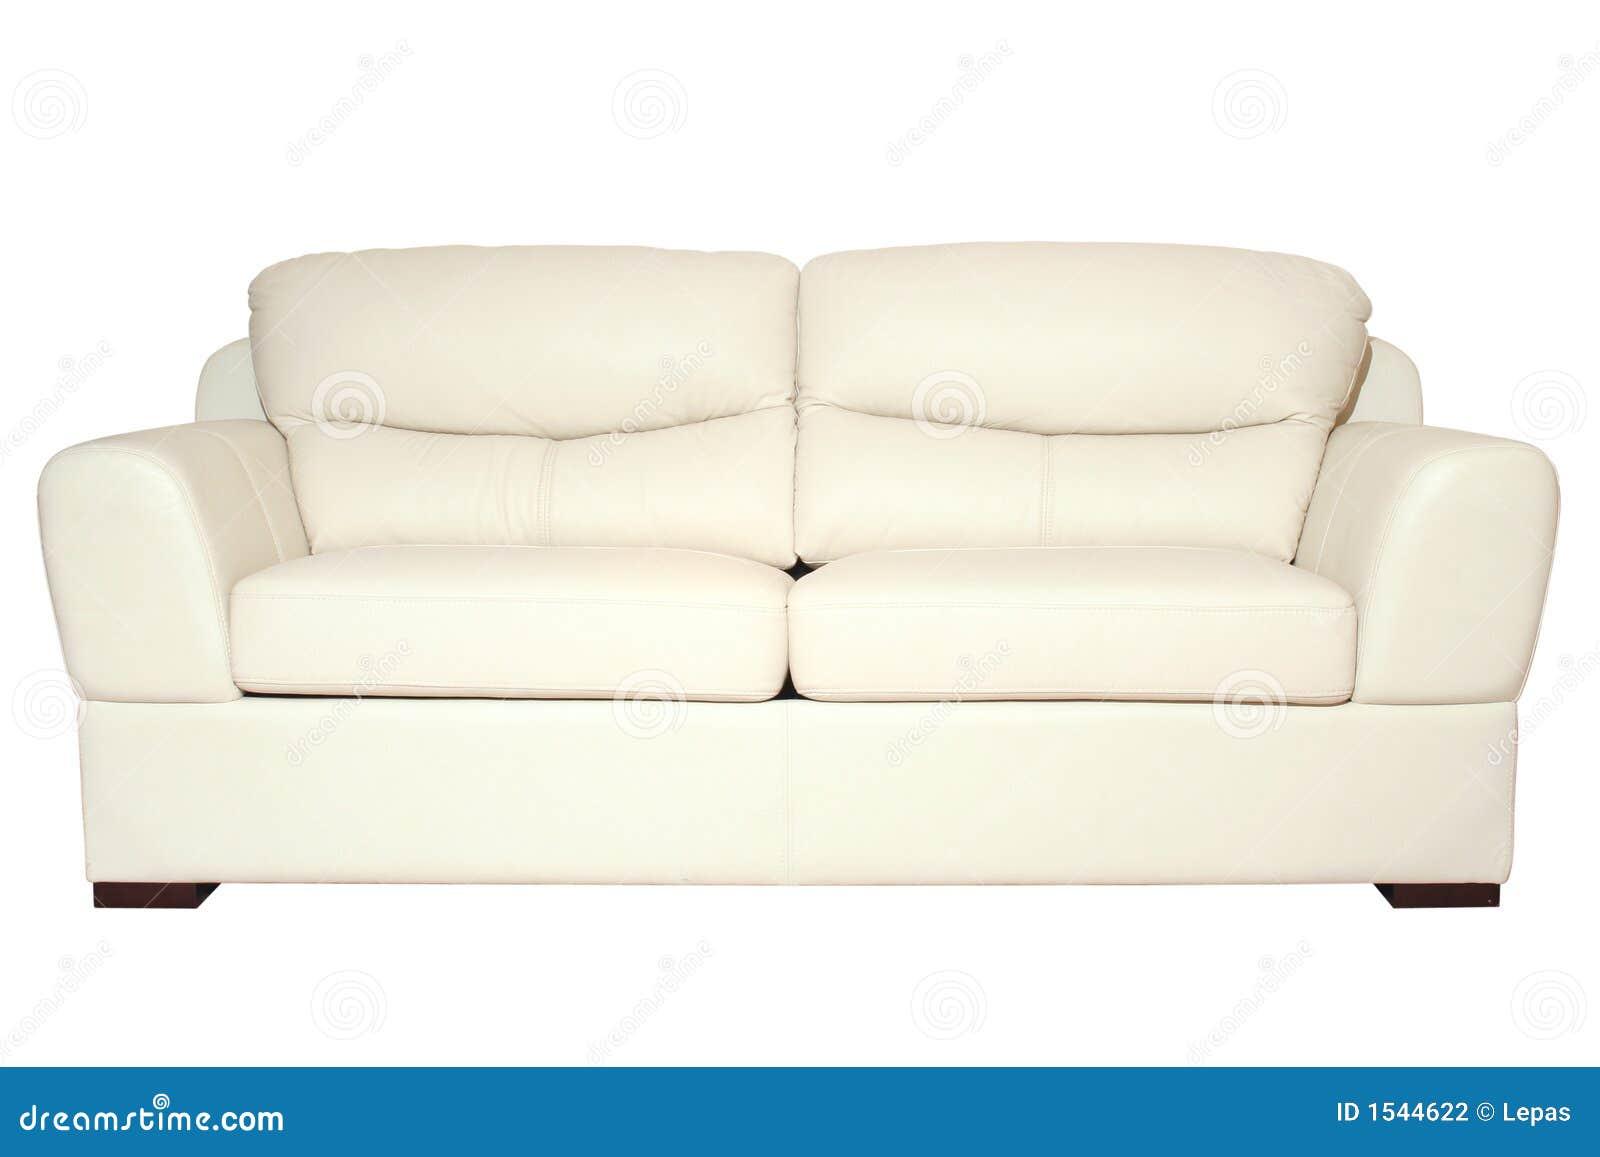 White Sofa Stock Photography Image 1544622